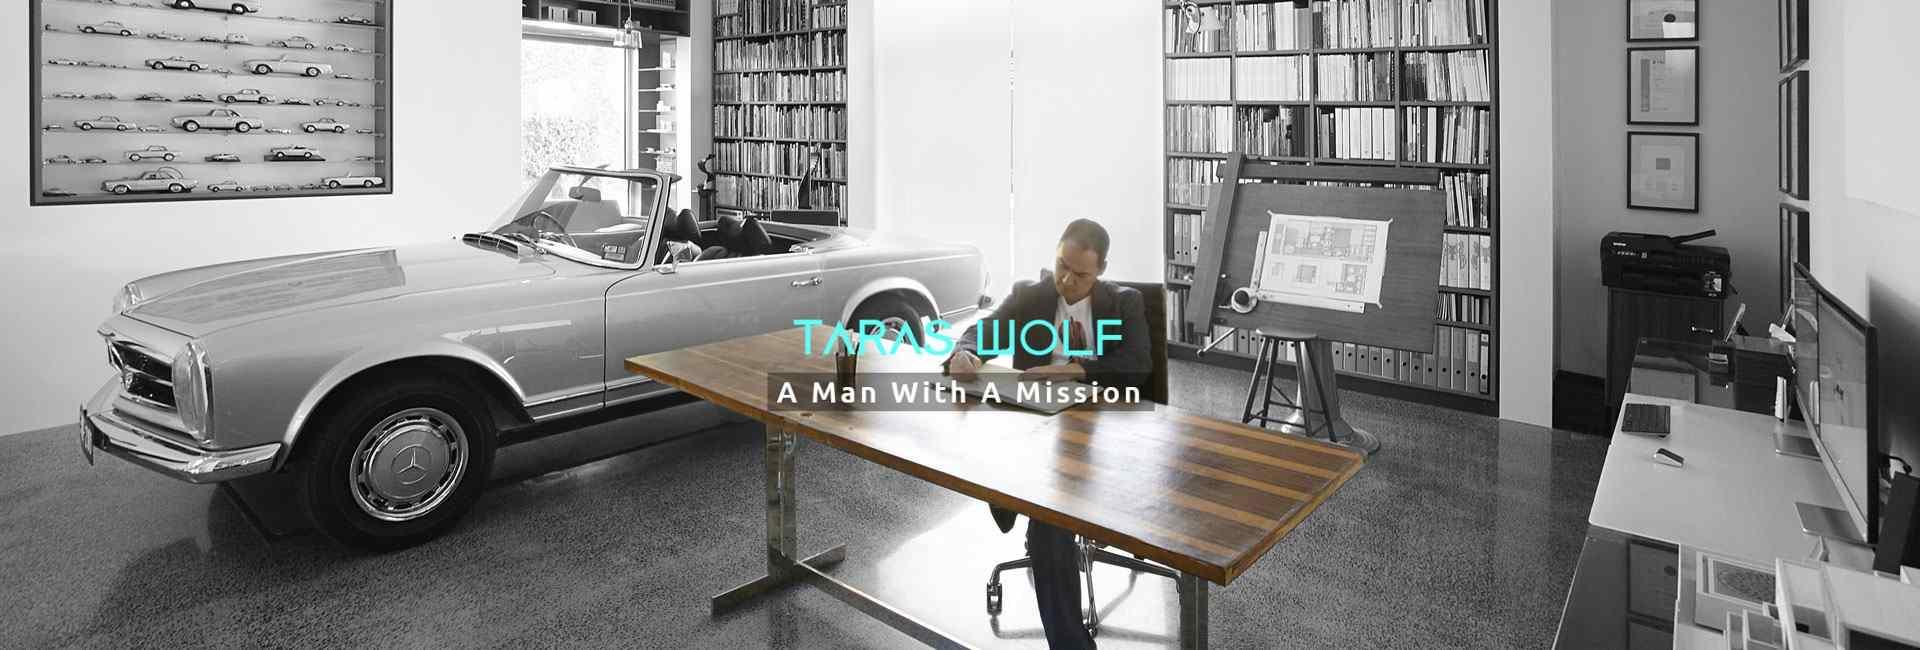 Taras Wolf at work